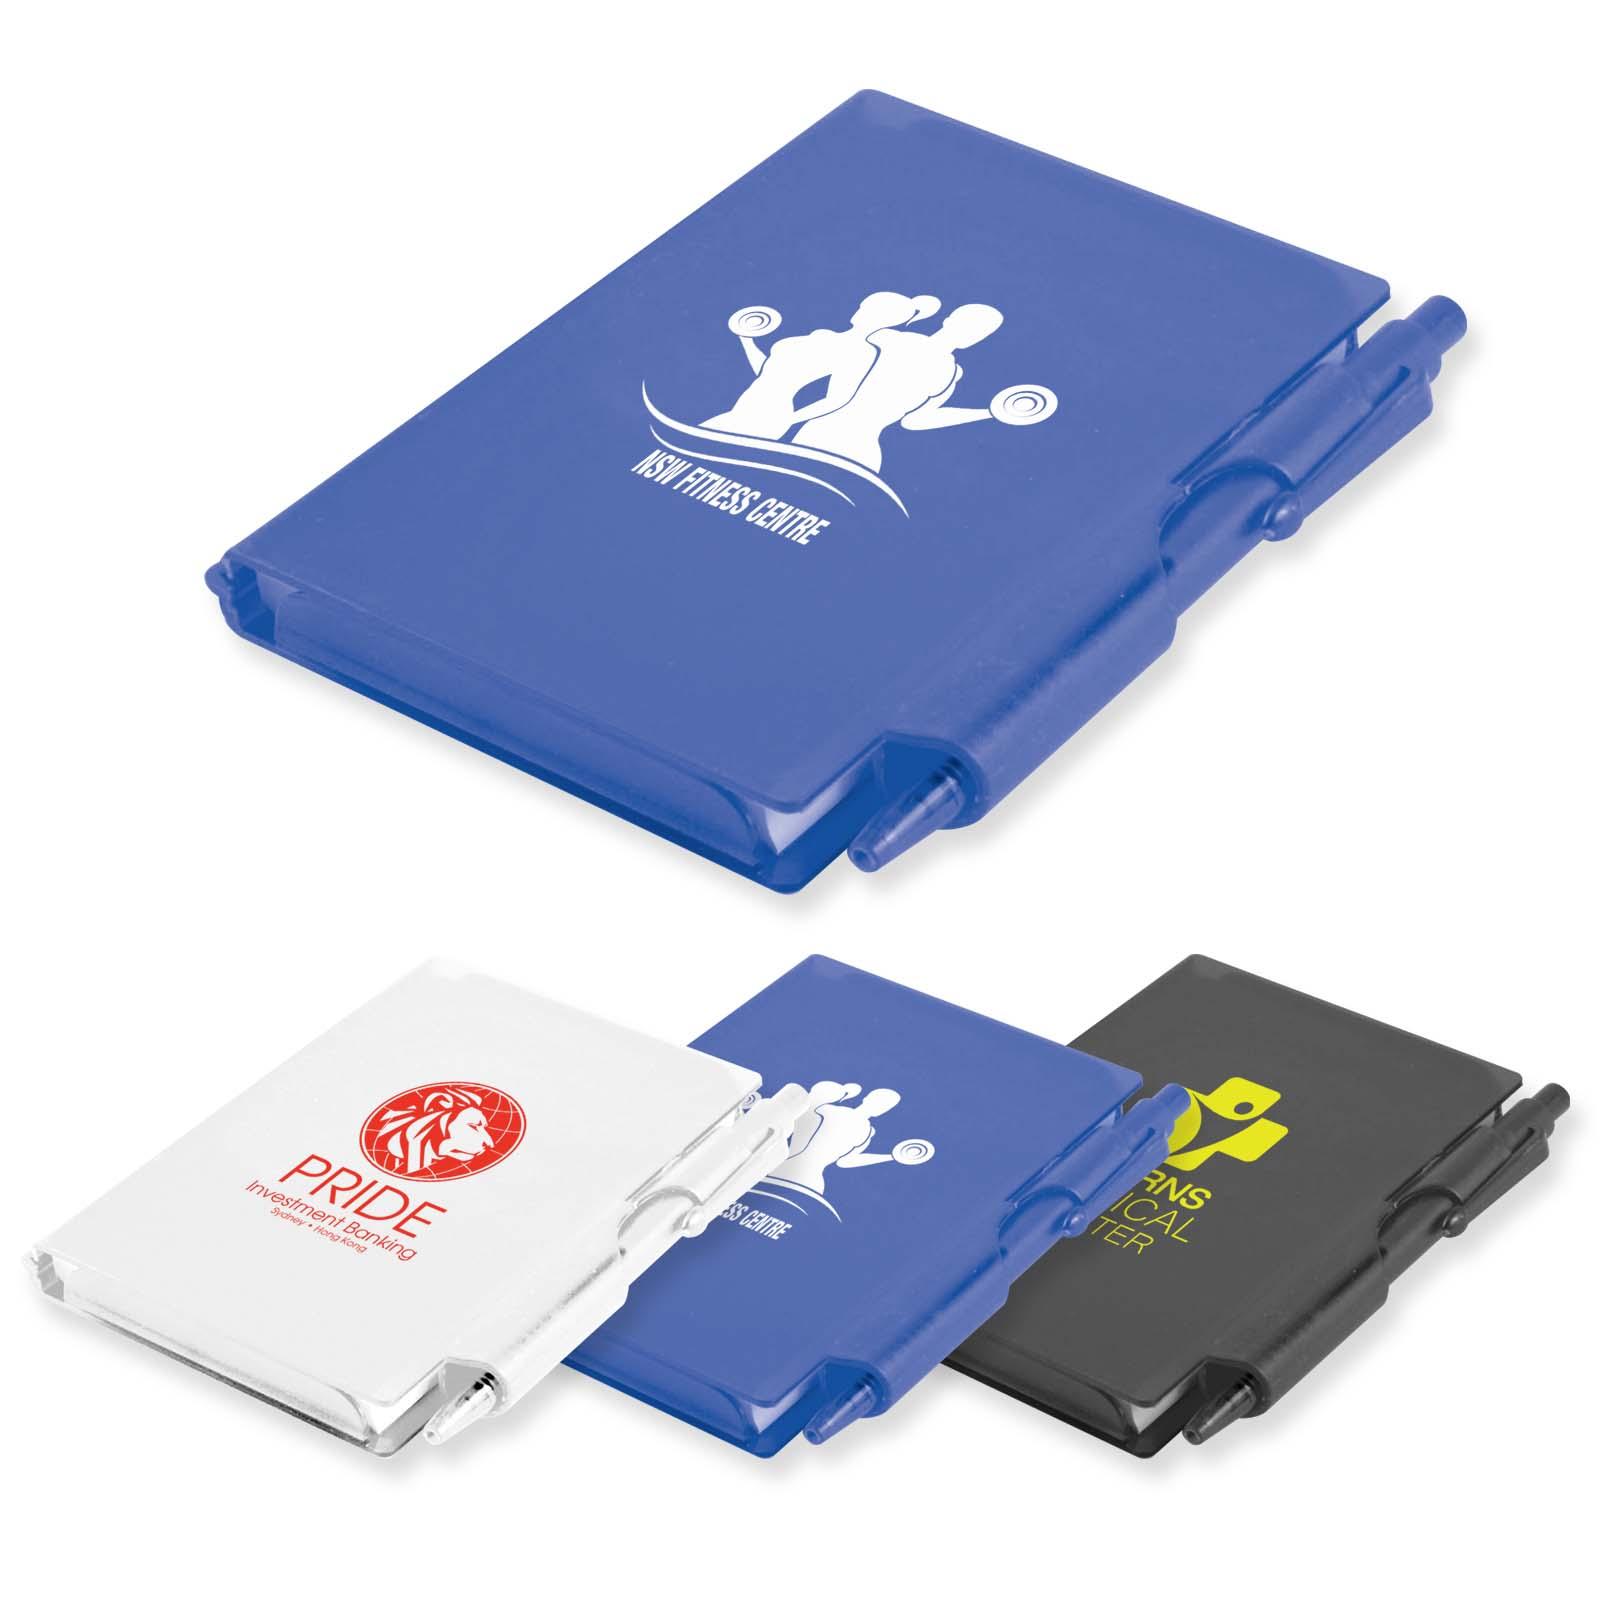 Odyssey Pocket Notebook with Pen